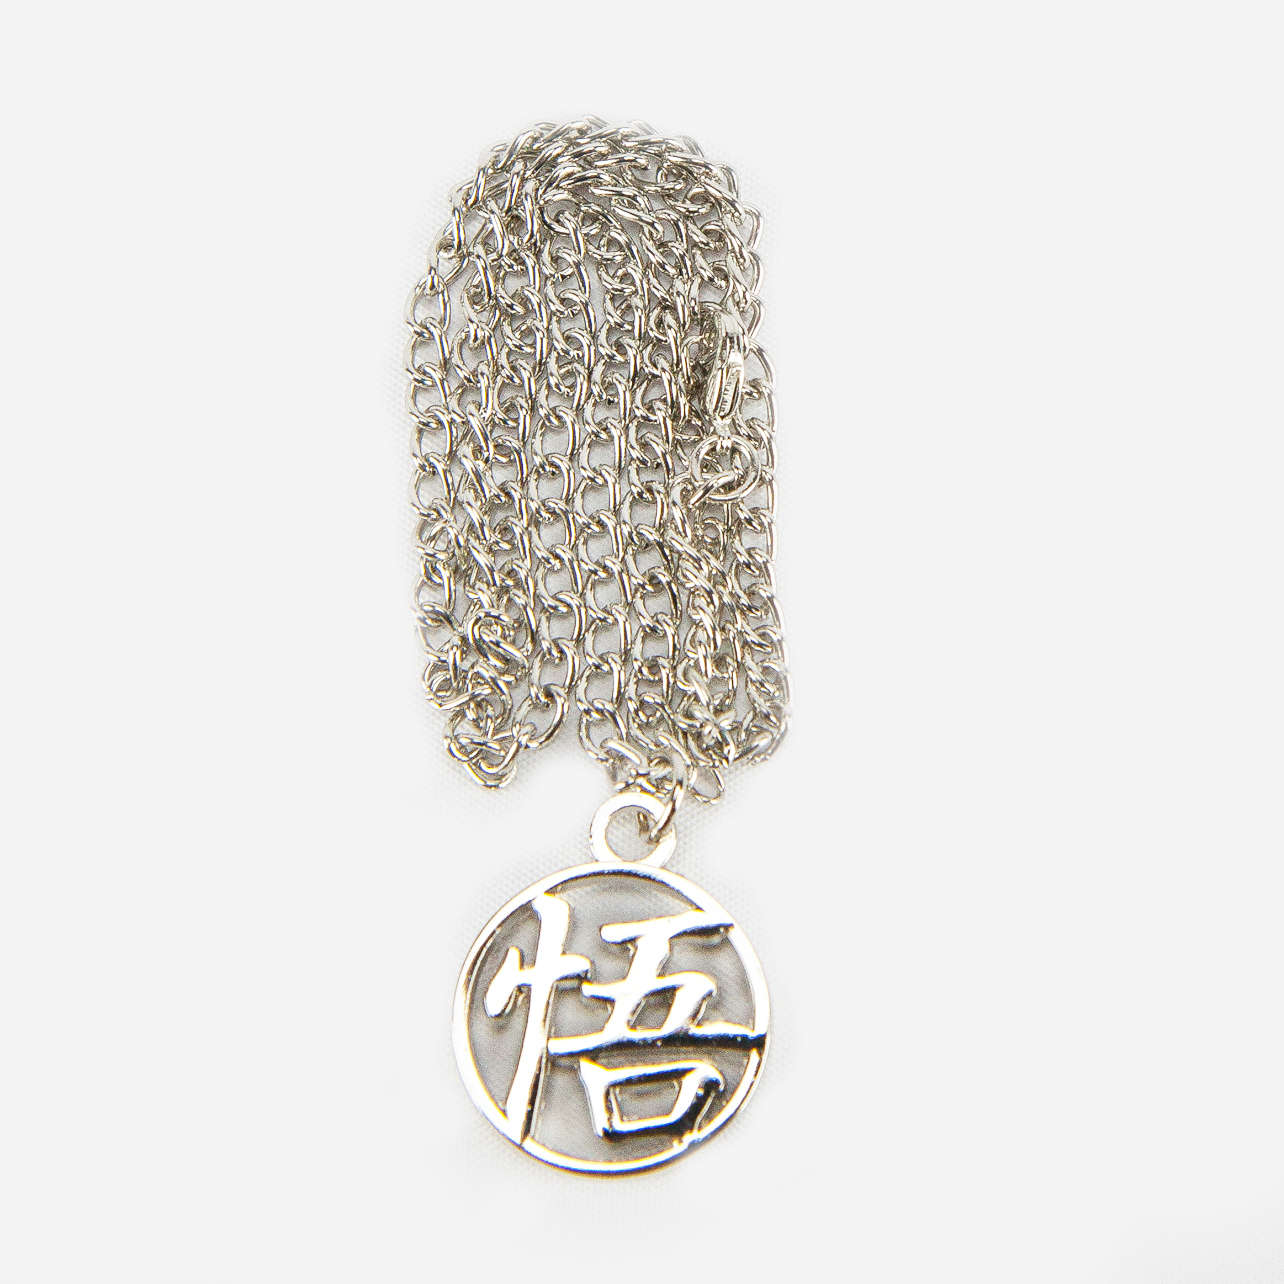 Goku Symbol Necklace accessories